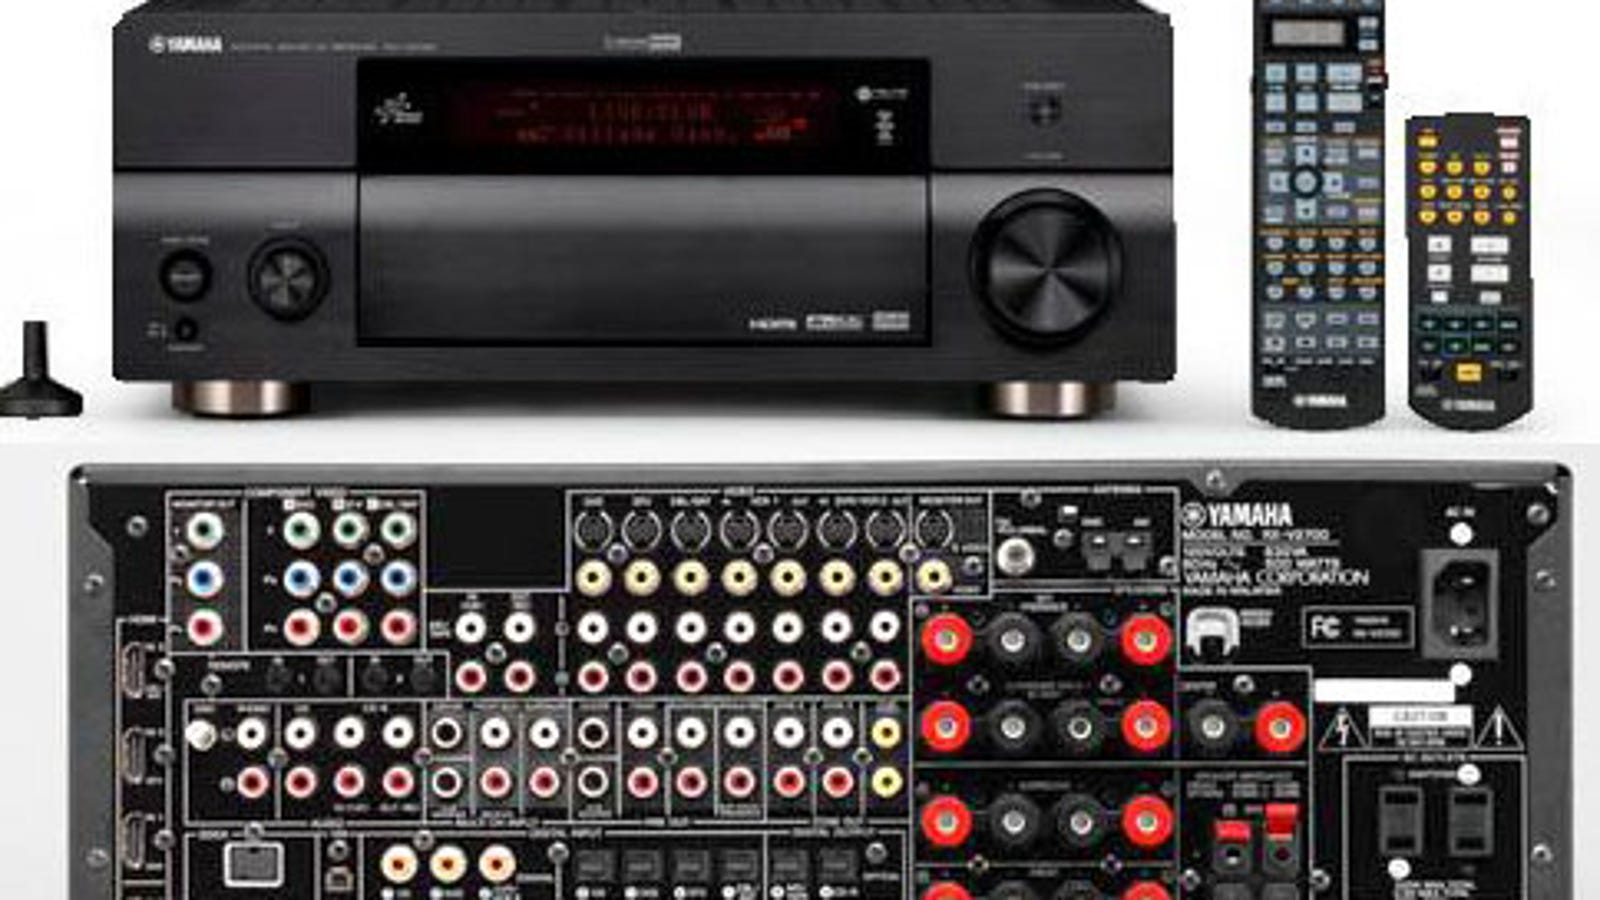 Yamaha RX-V2700 and RX-V1700 HDMI Receivers